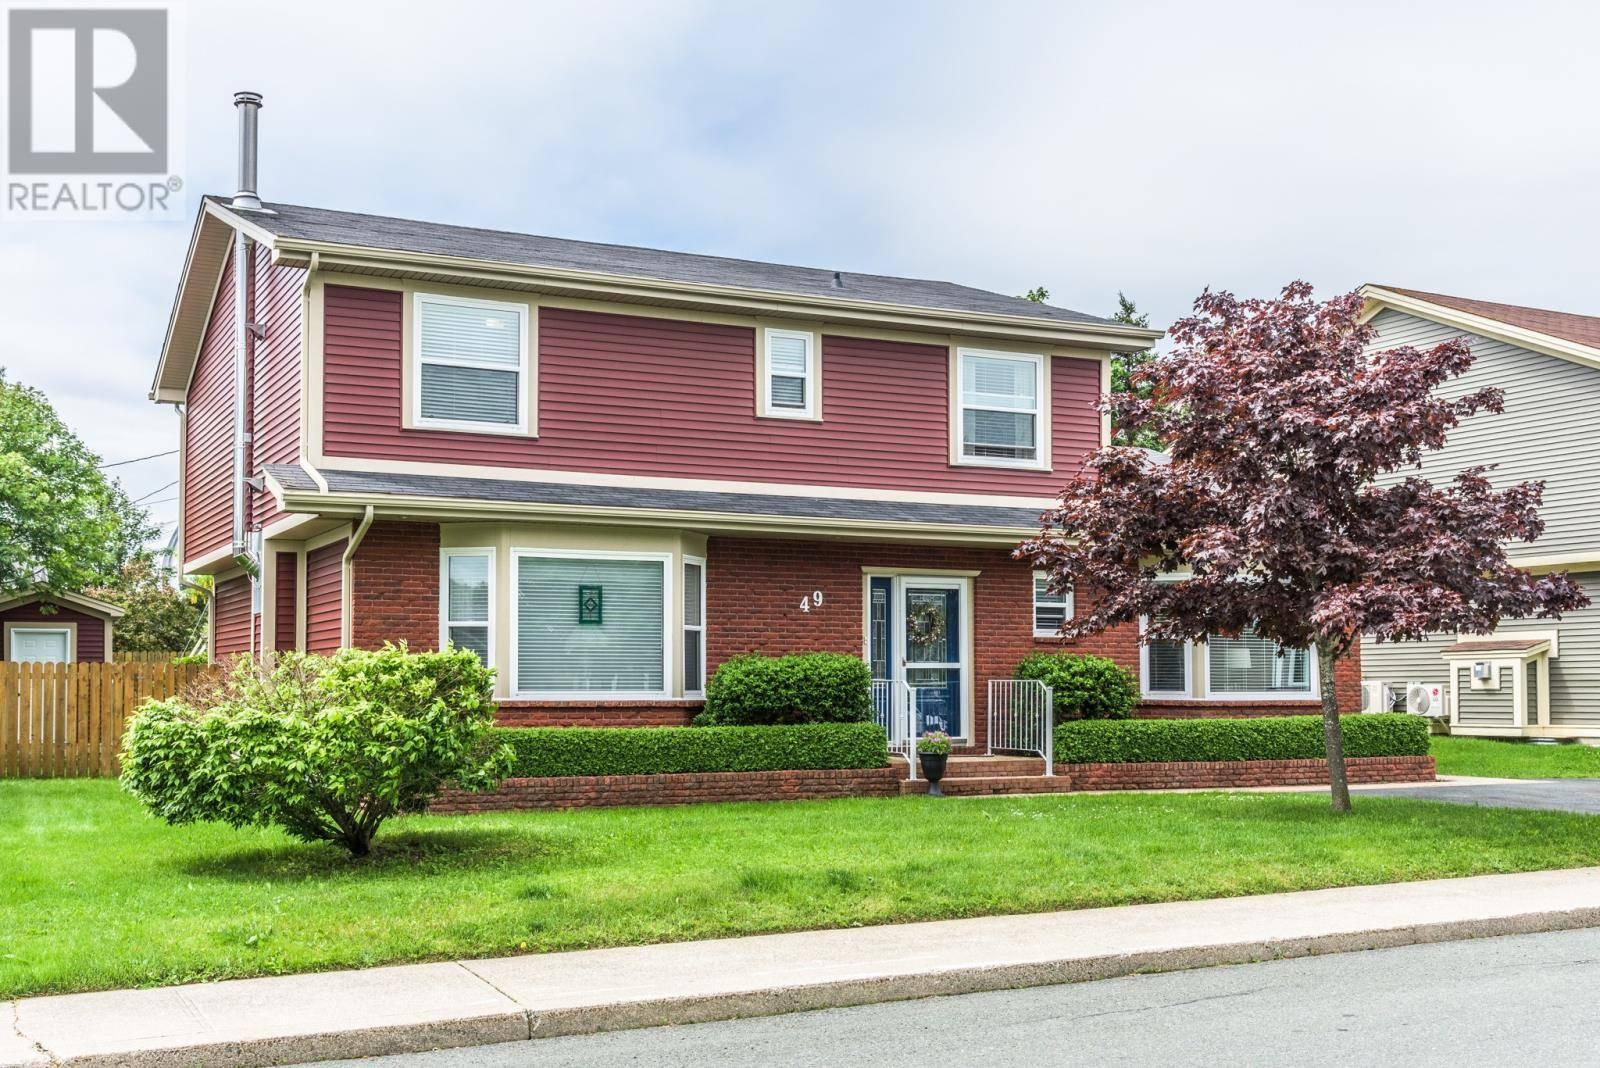 House for sale at 49 Mountbatten Dr St. John's Newfoundland - MLS: 1199927